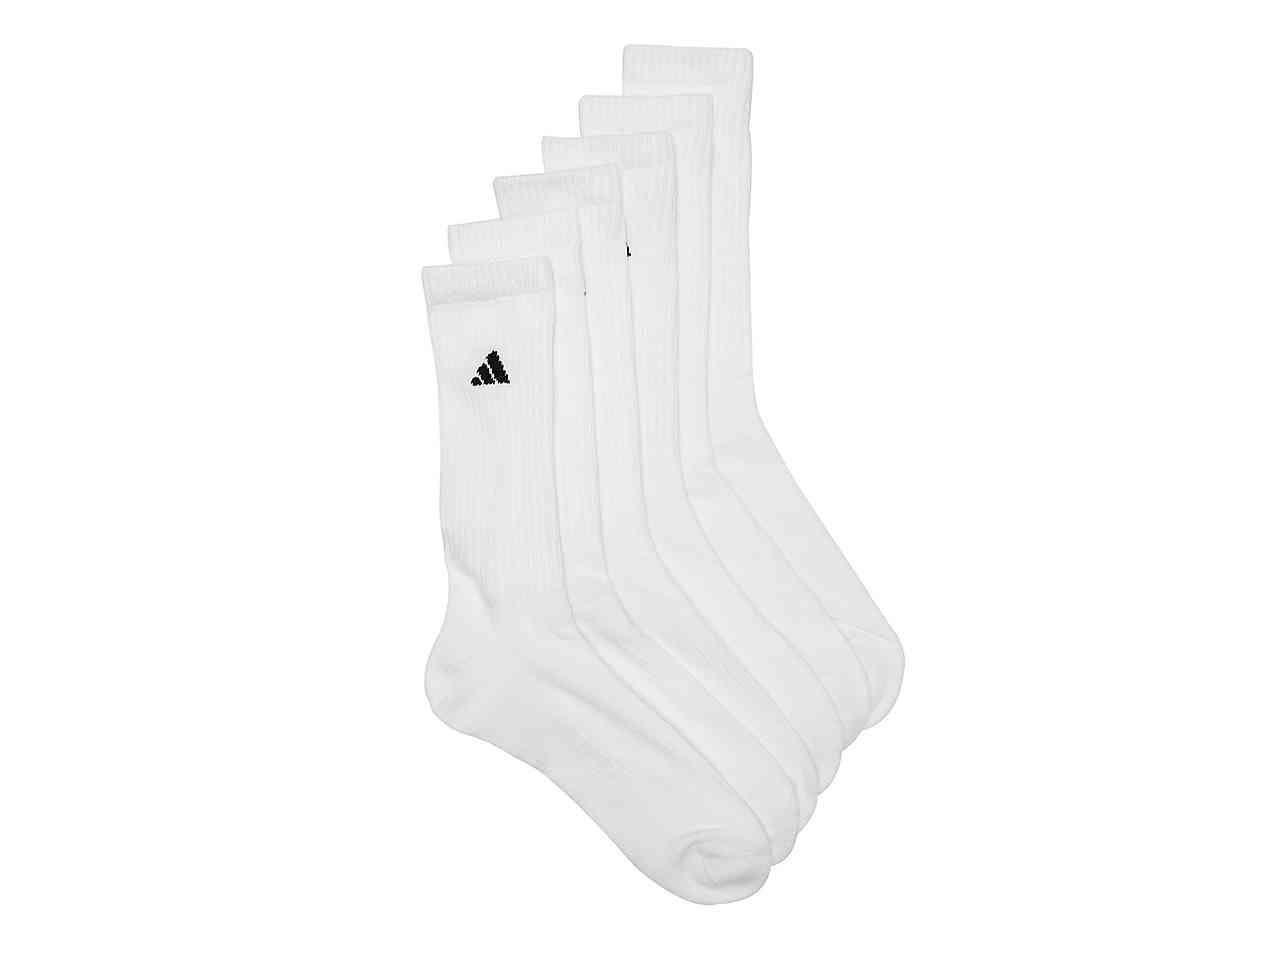 1400e2761 Lyst - adidas Climalite Compression Crew Socks in White for Men